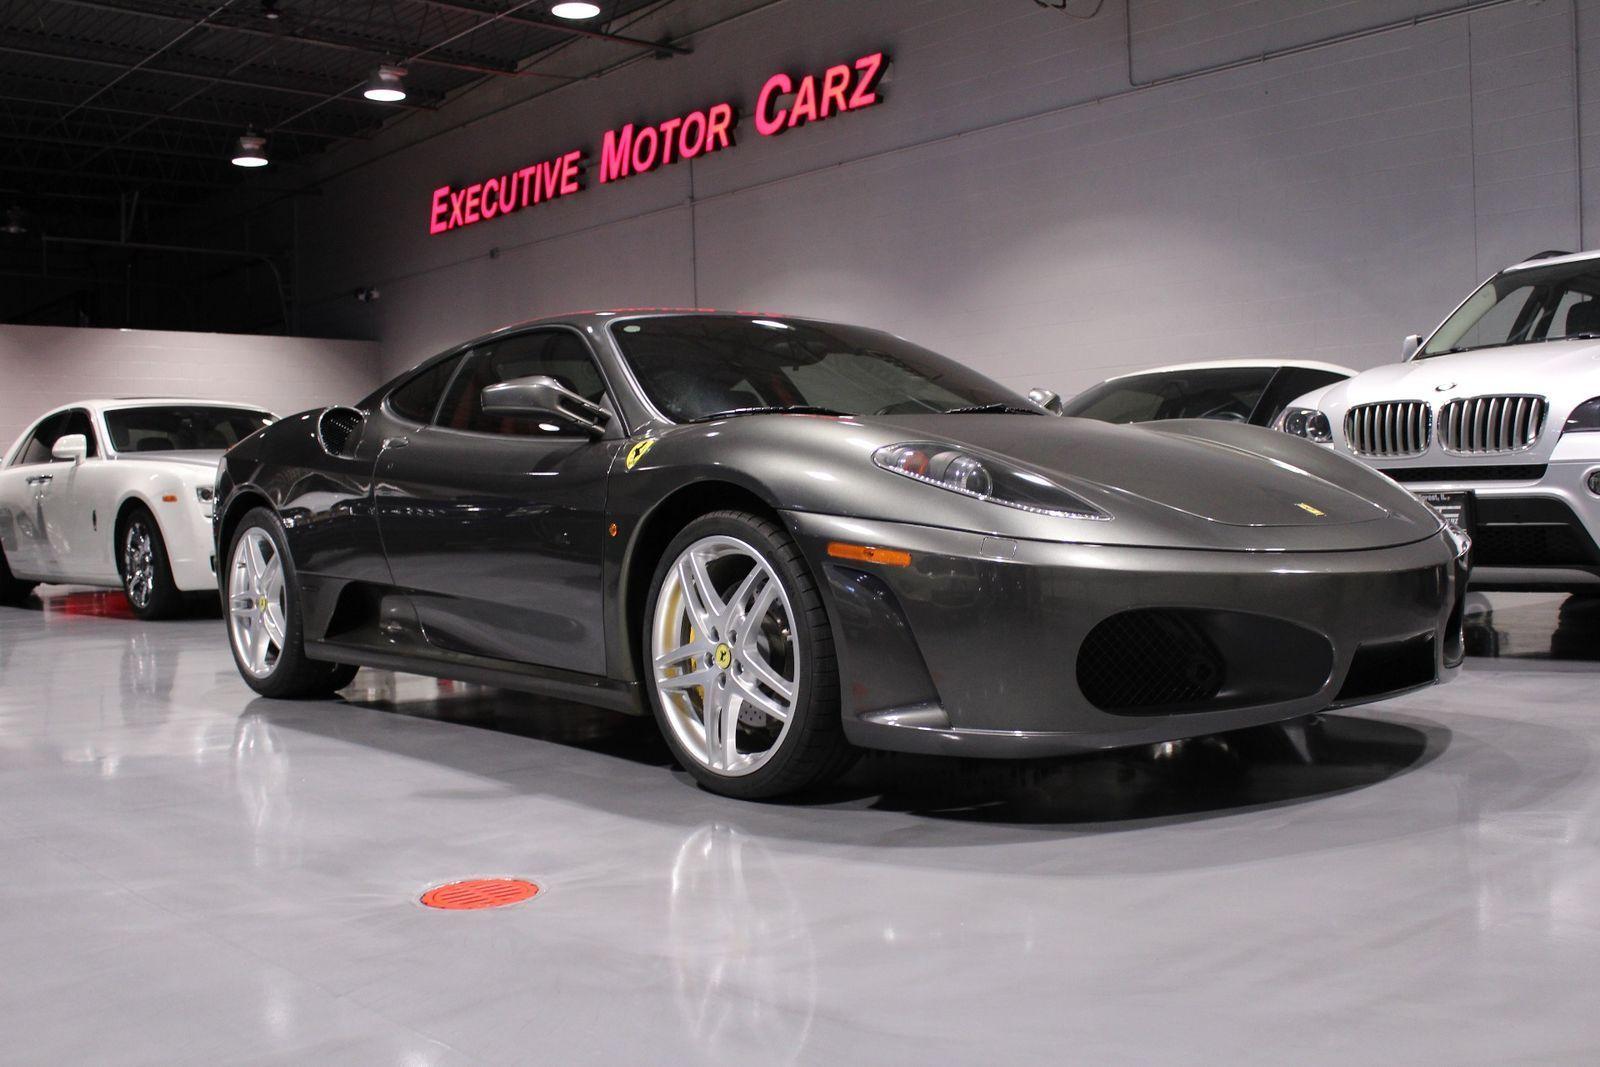 Great Ferrari F430 2007 Gray! RED INTERIOR! YELLOW CALIPERS